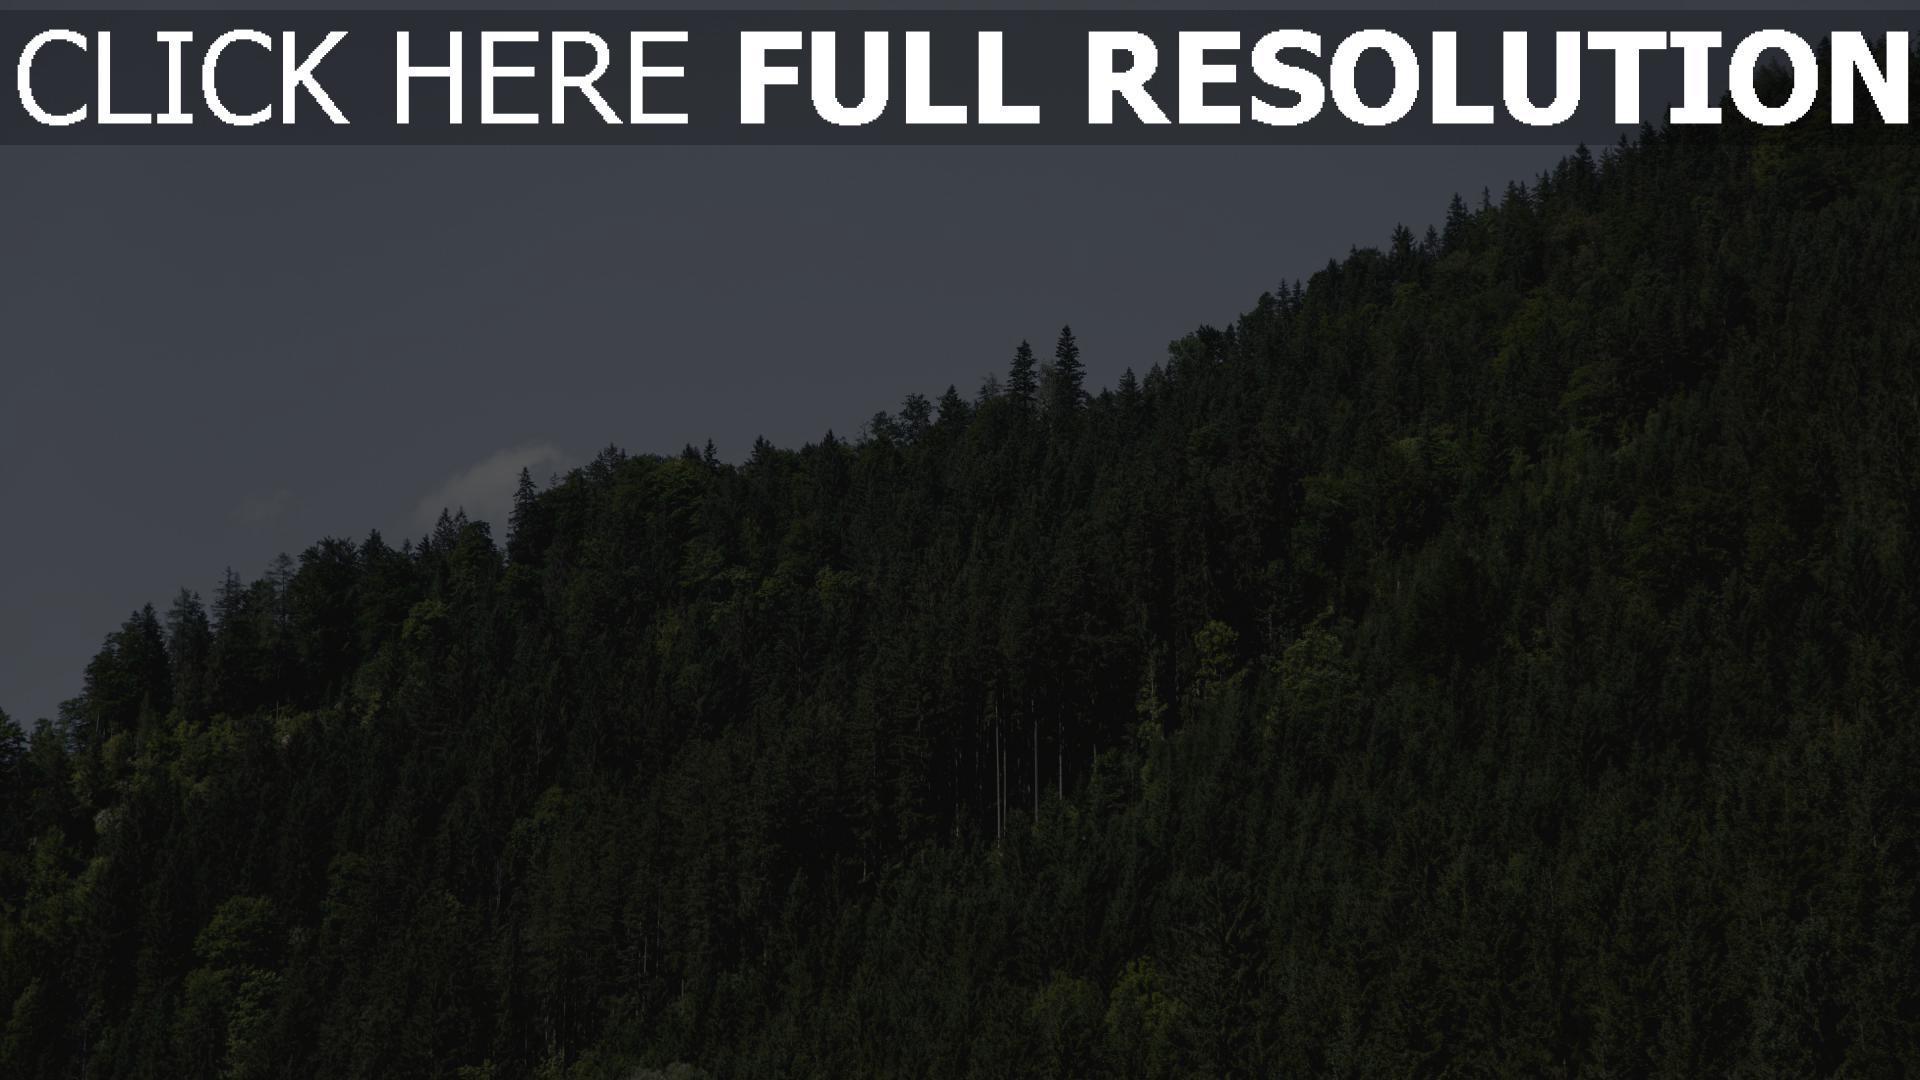 hd hintergrundbilder bäume grün hügel himmel 1920x1080